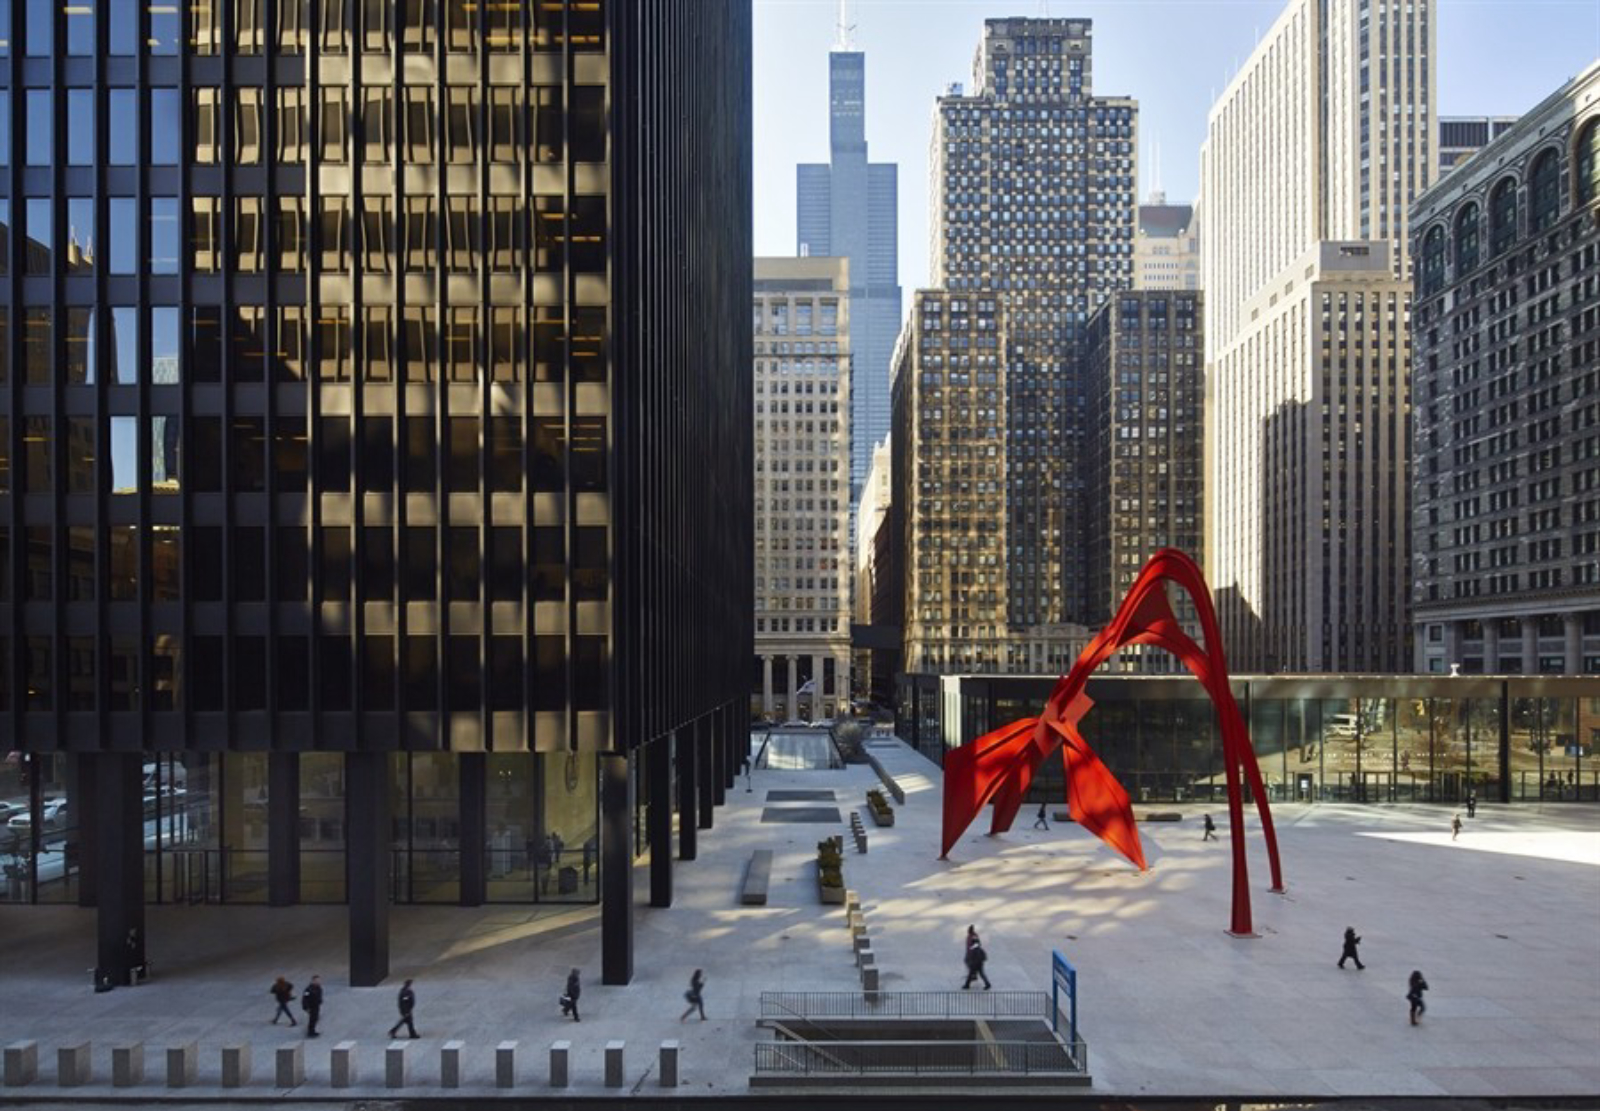 Chicago Mies Van Der Rohe Tour chicago federal center - docomomo